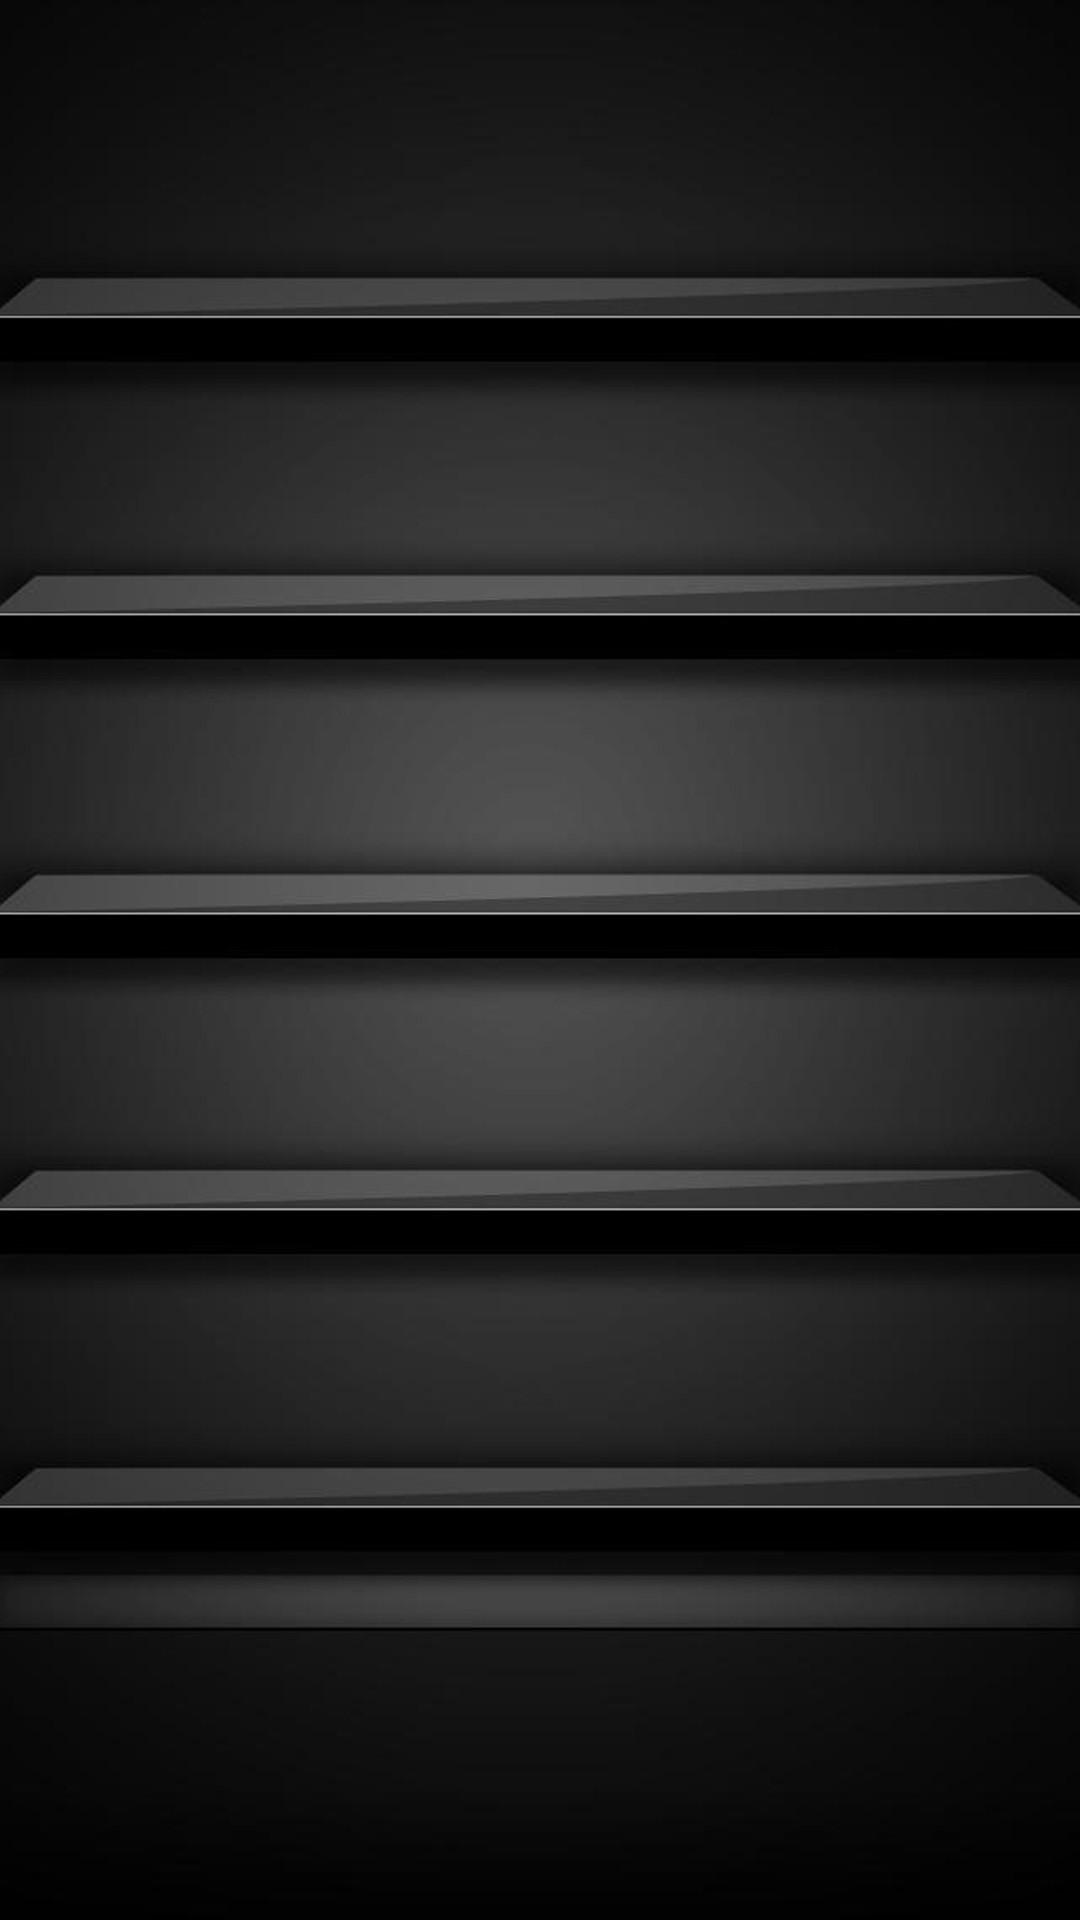 black shelf iphone 6 hd lock screen wallpapers Quotes